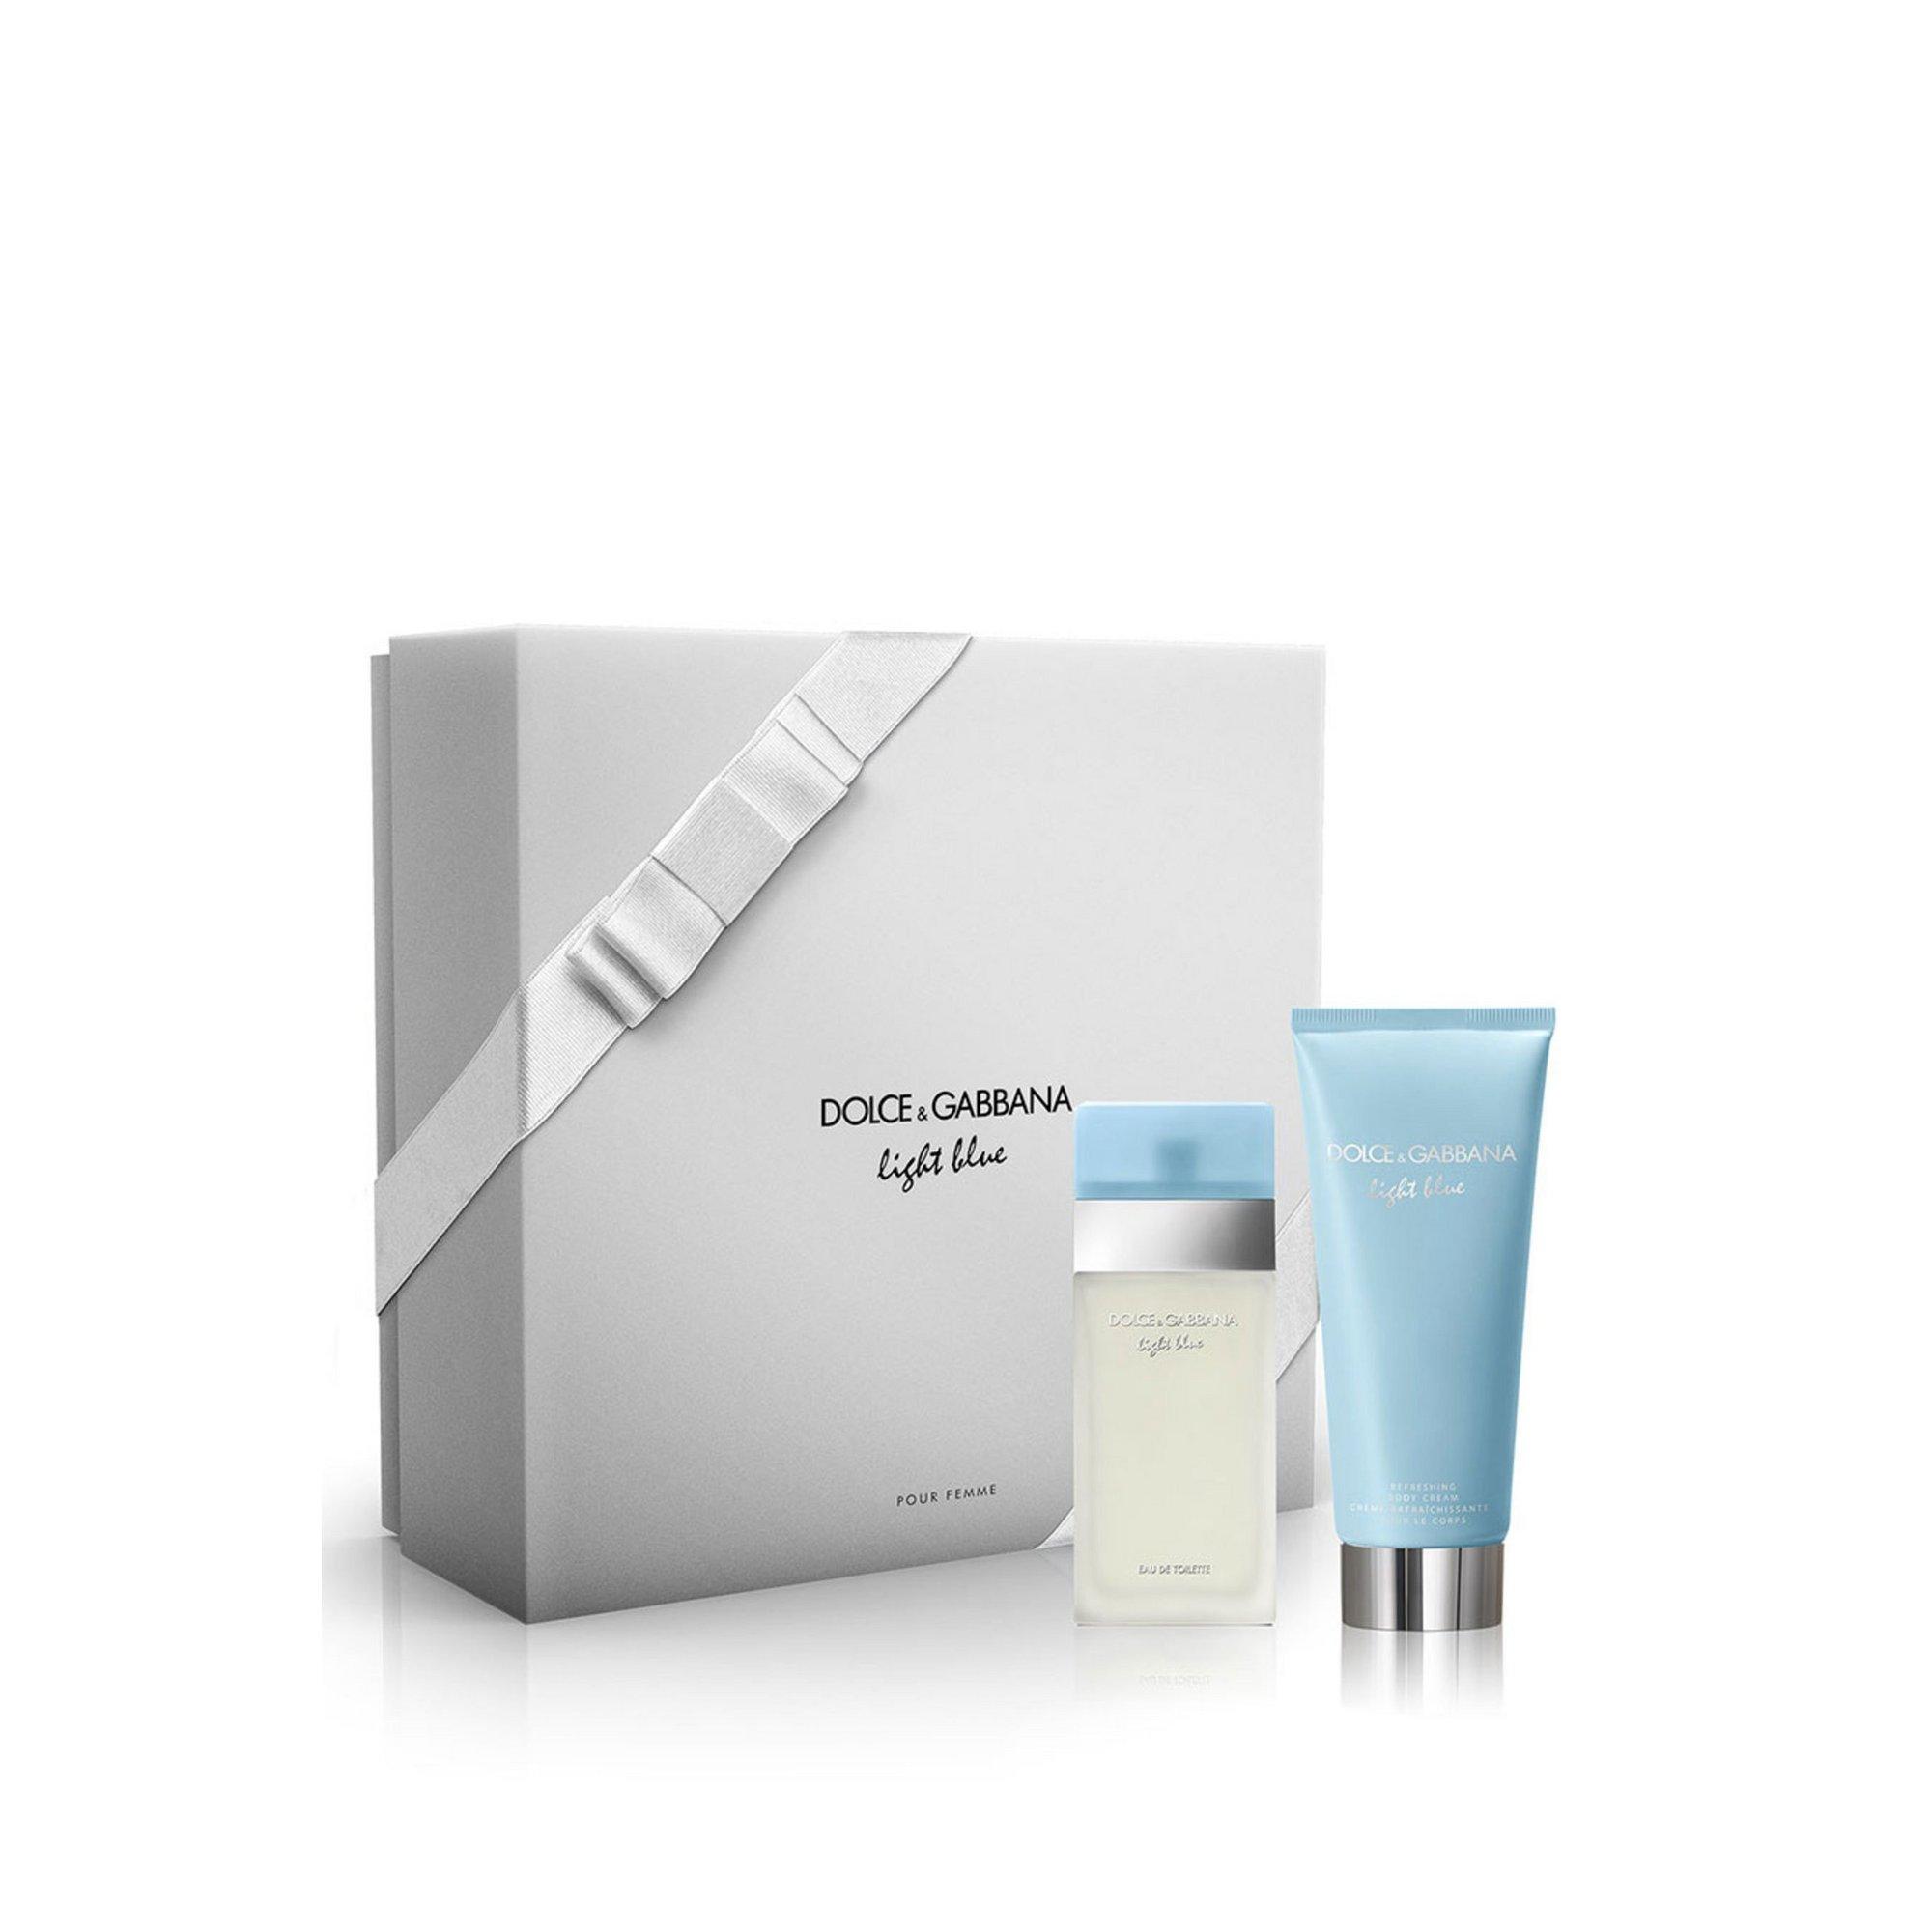 Image of Dolce and Gabanna Light Blue 25ml Eau De Toilette Gift Set